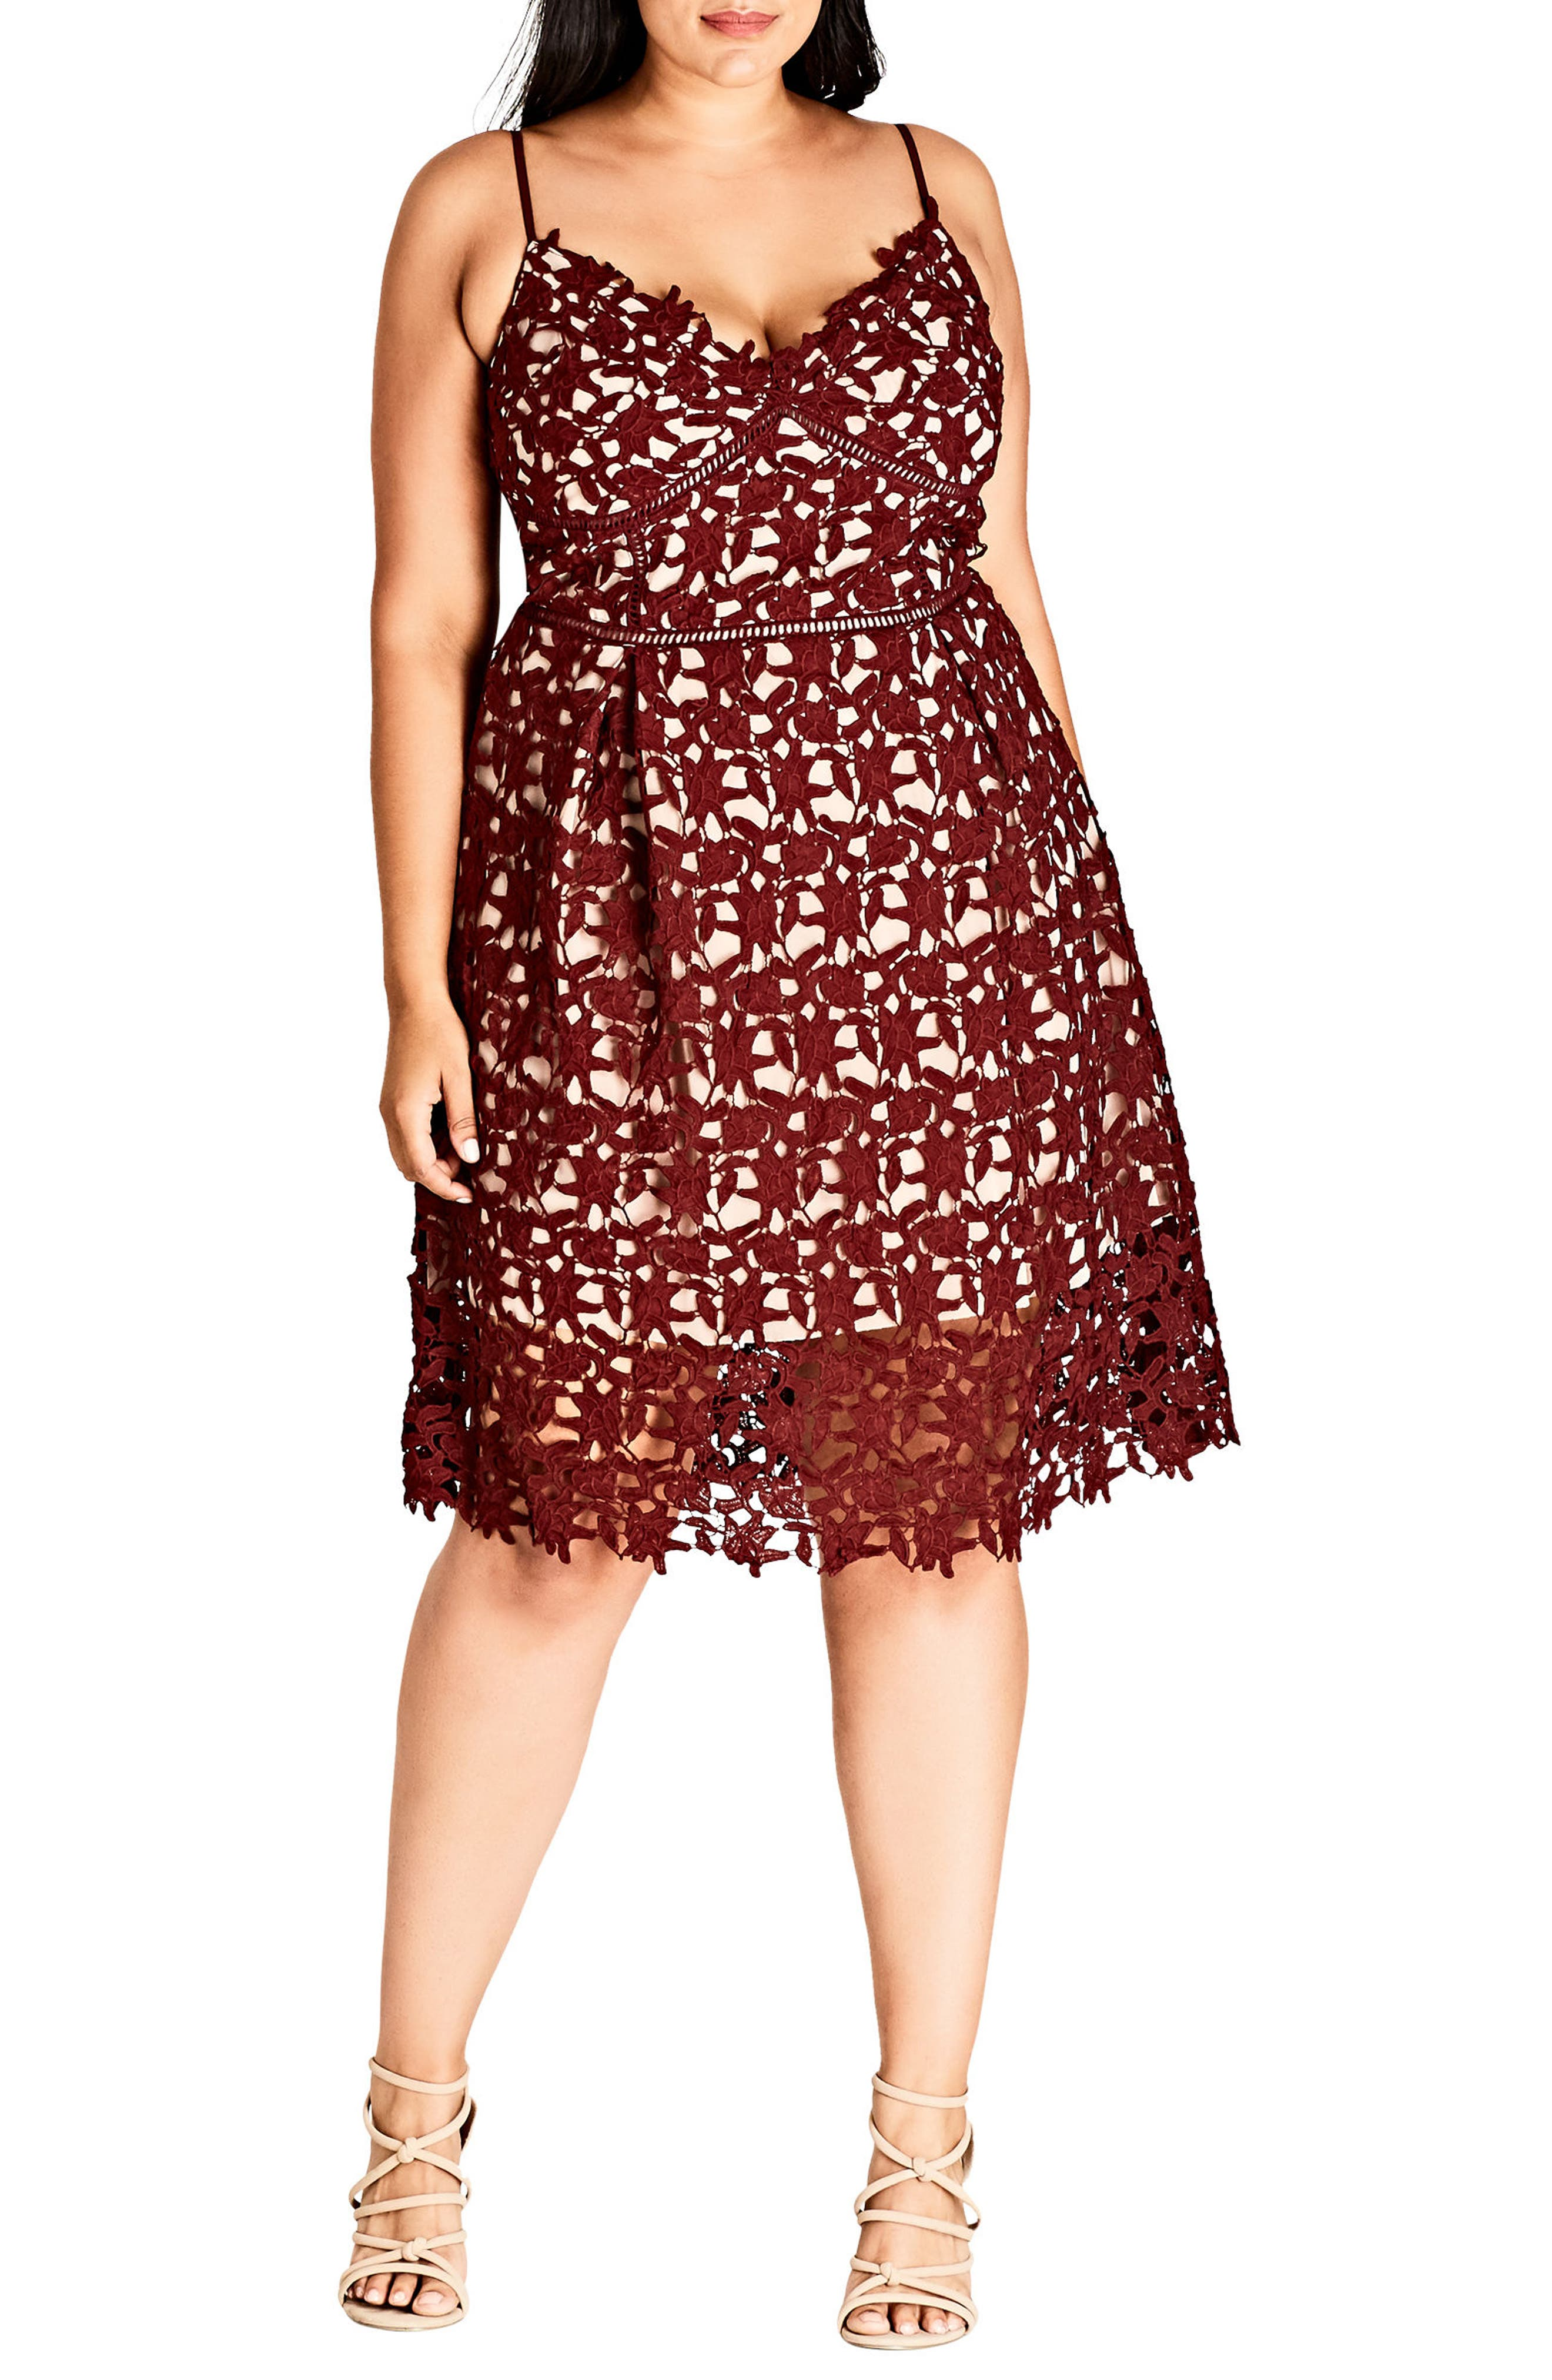 So Fancy Lace Dress,                         Main,                         color, Ruby